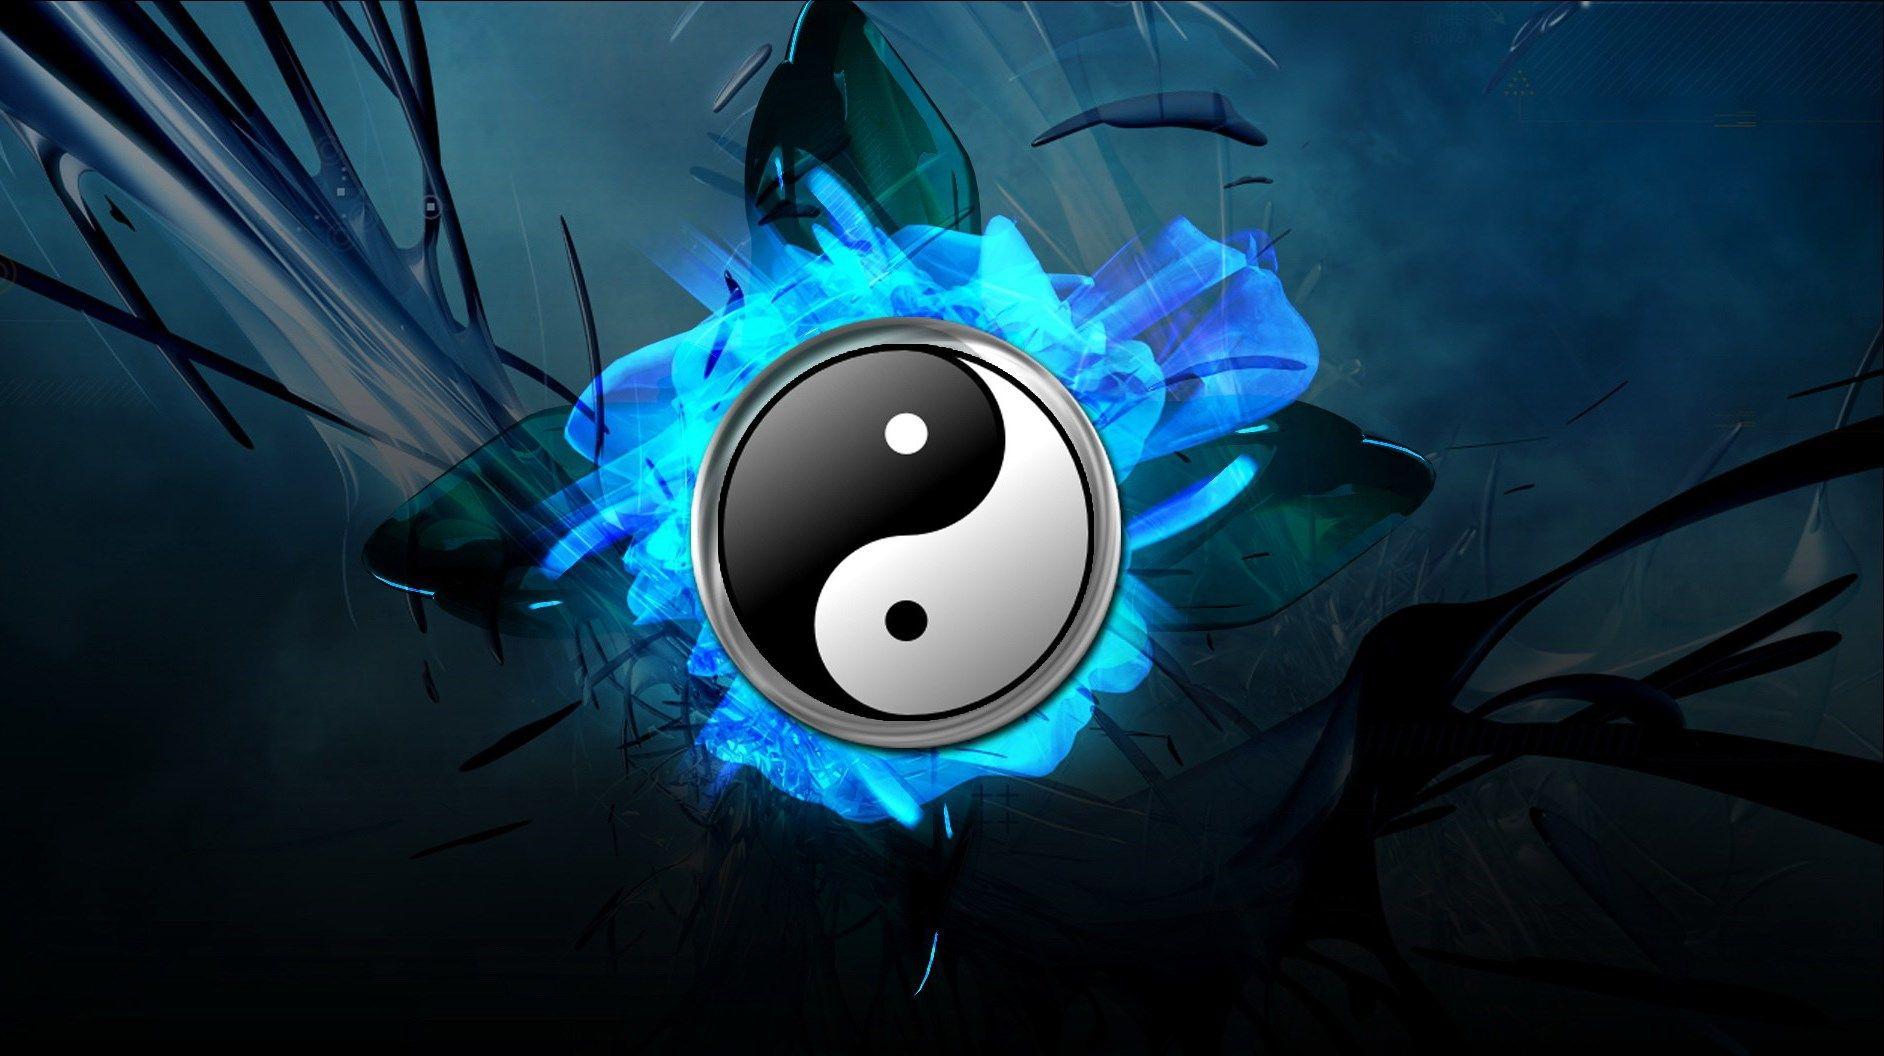 Yin and yang free x hueputalo pinterest